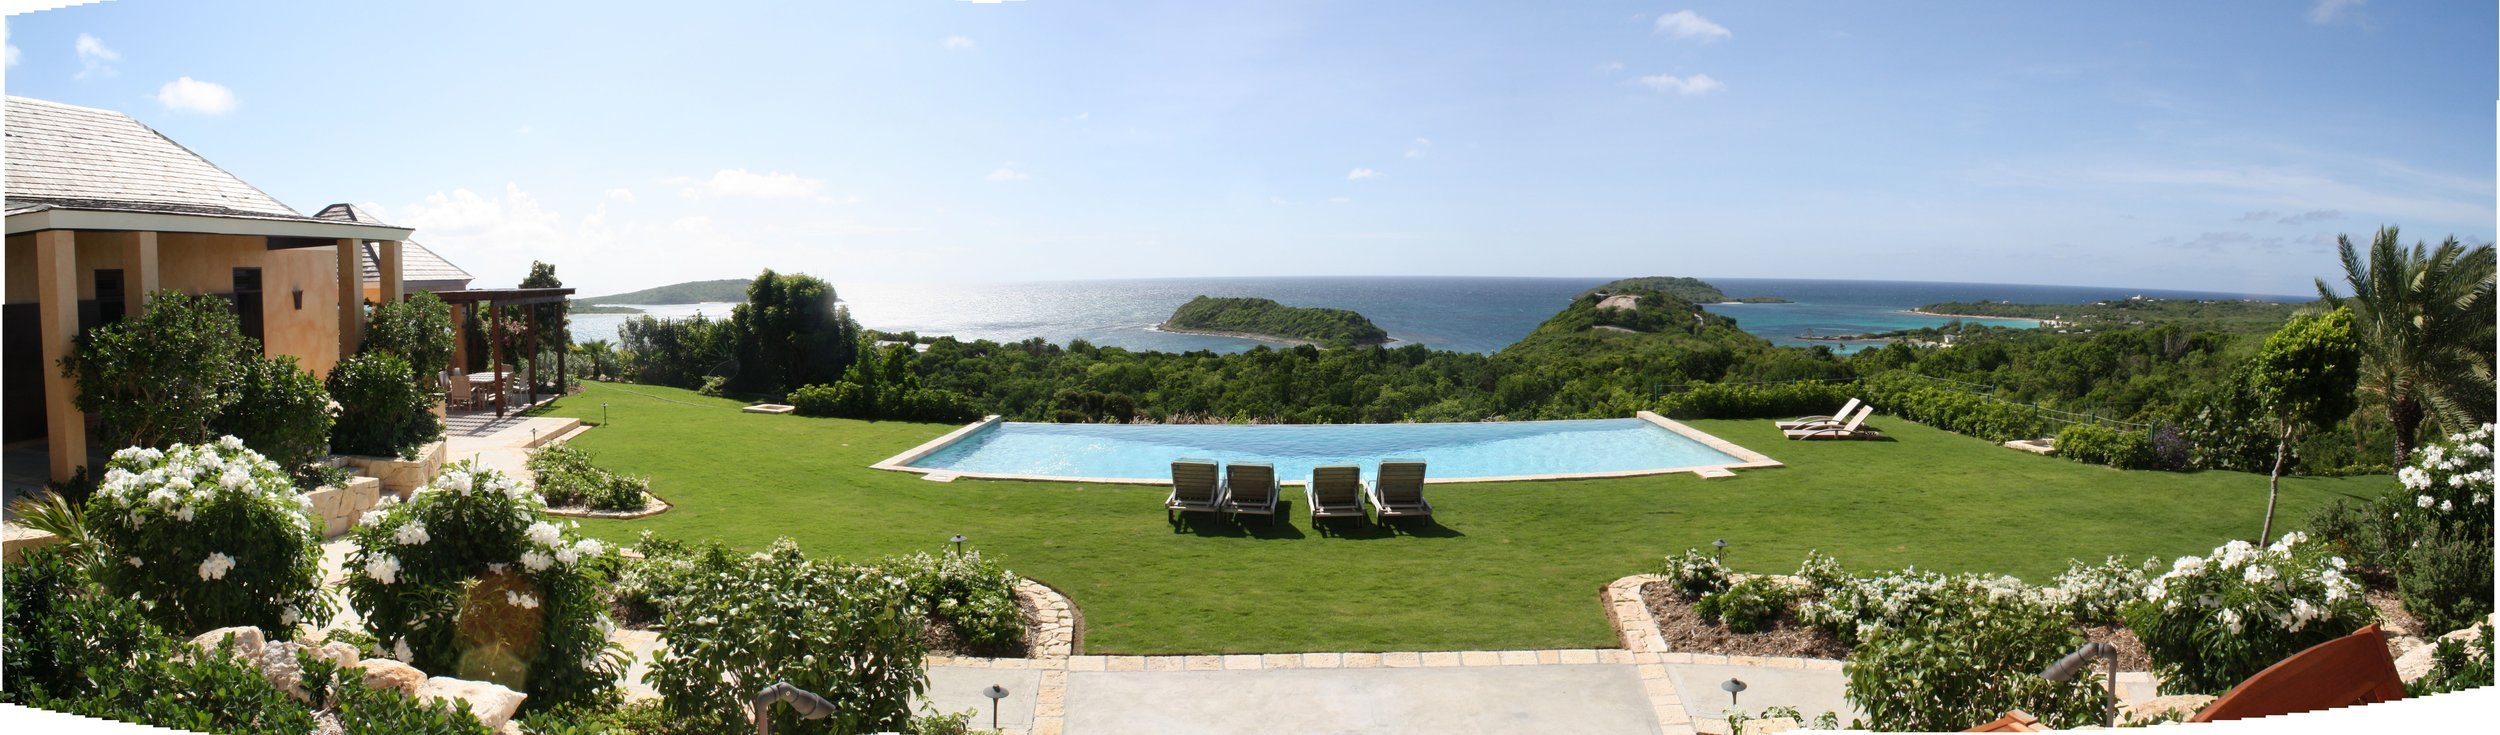 Isham pool panorama.jpg